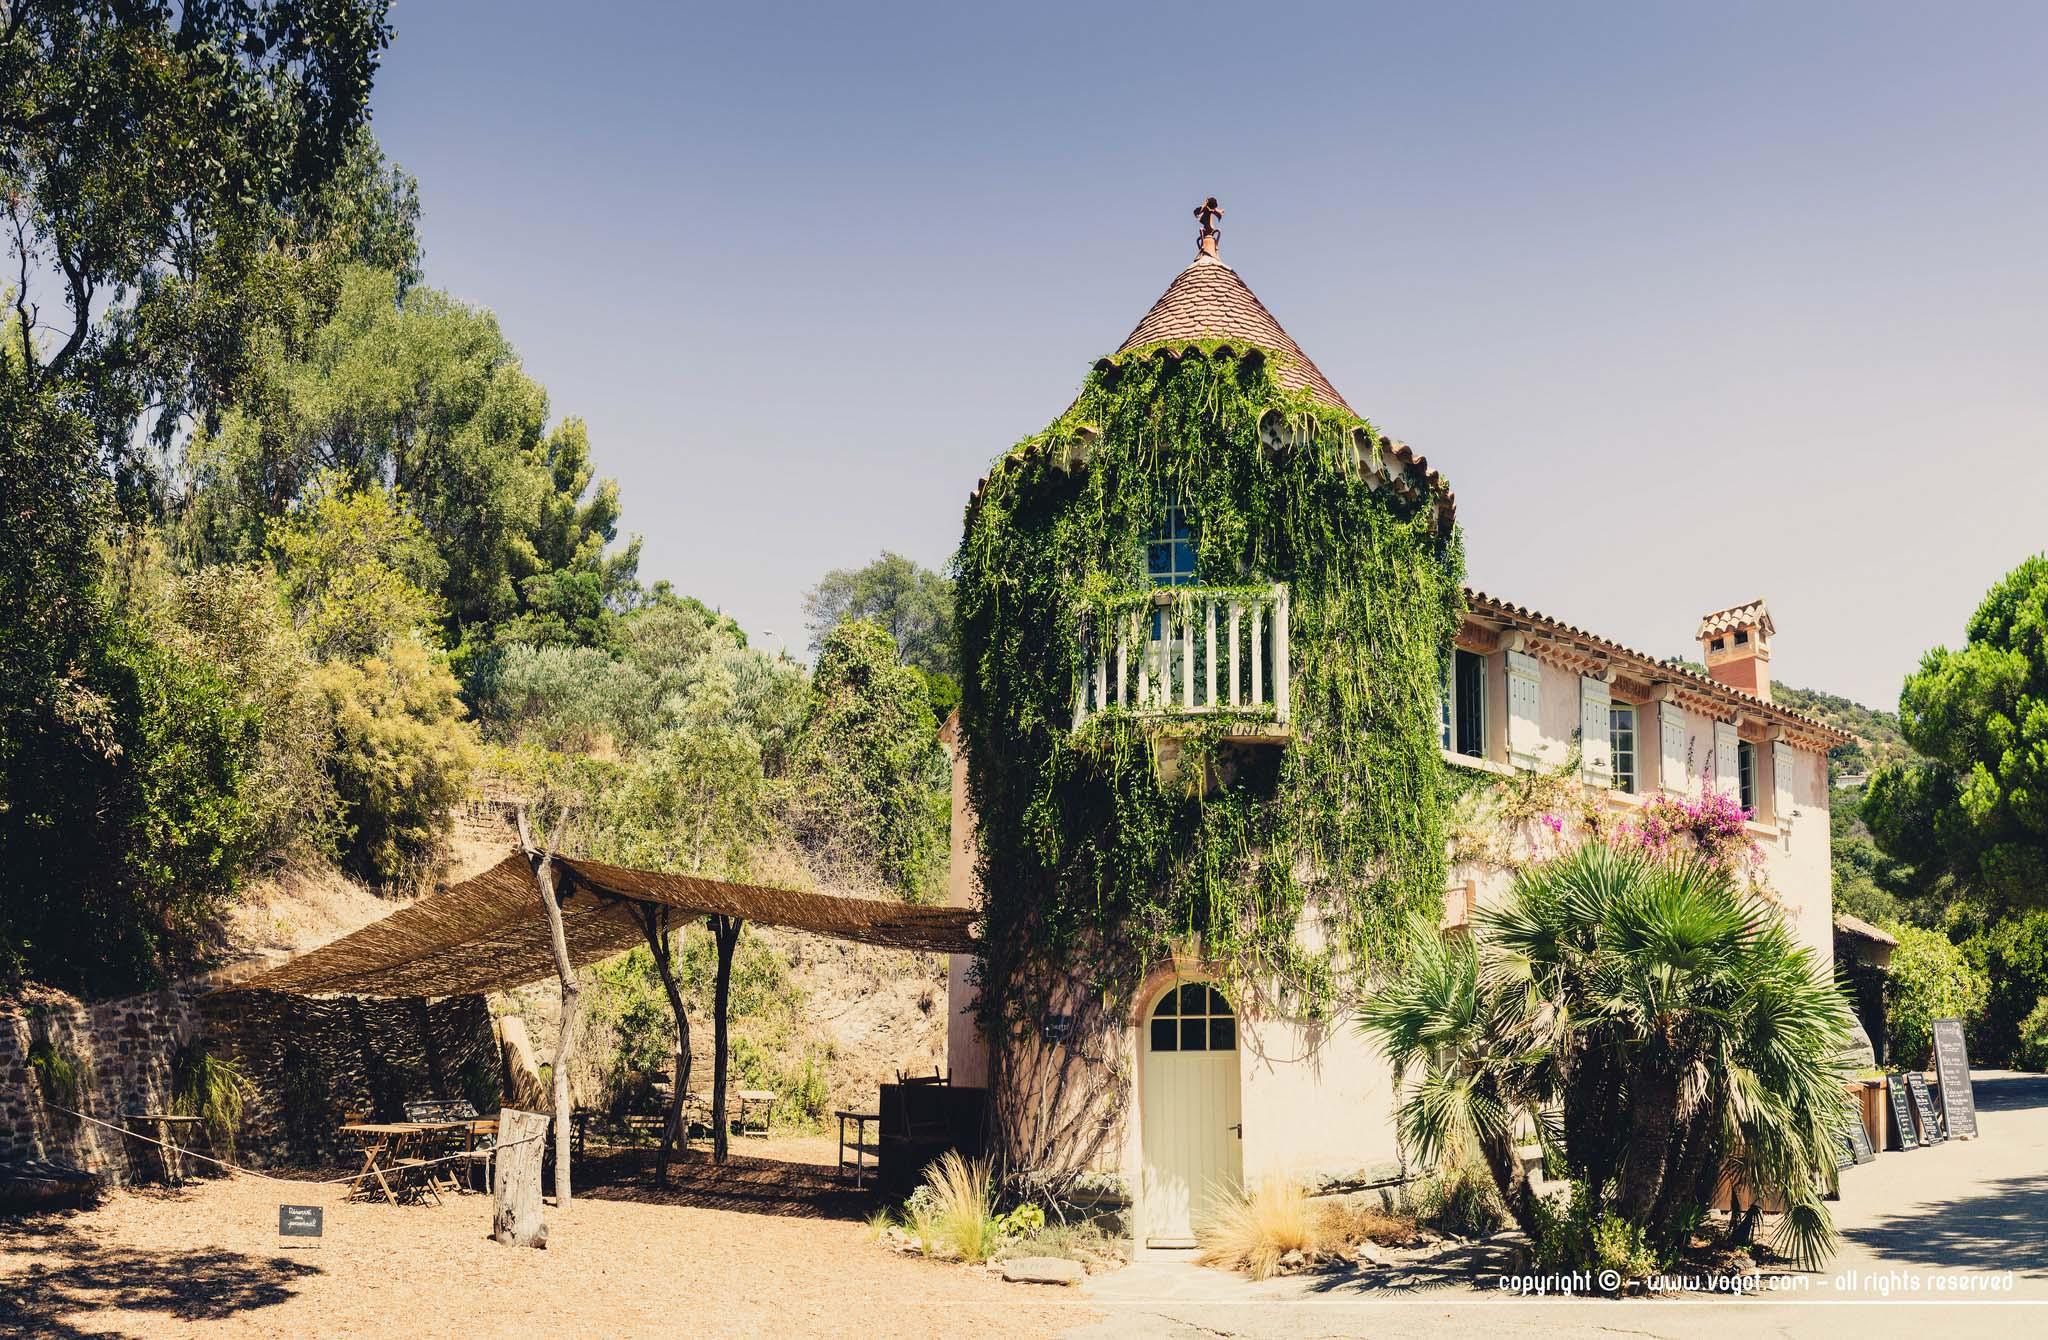 Visiter le domaine du rayol jardin plan taire et sentier - Domaine du rayol le jardin des mediterranees ...